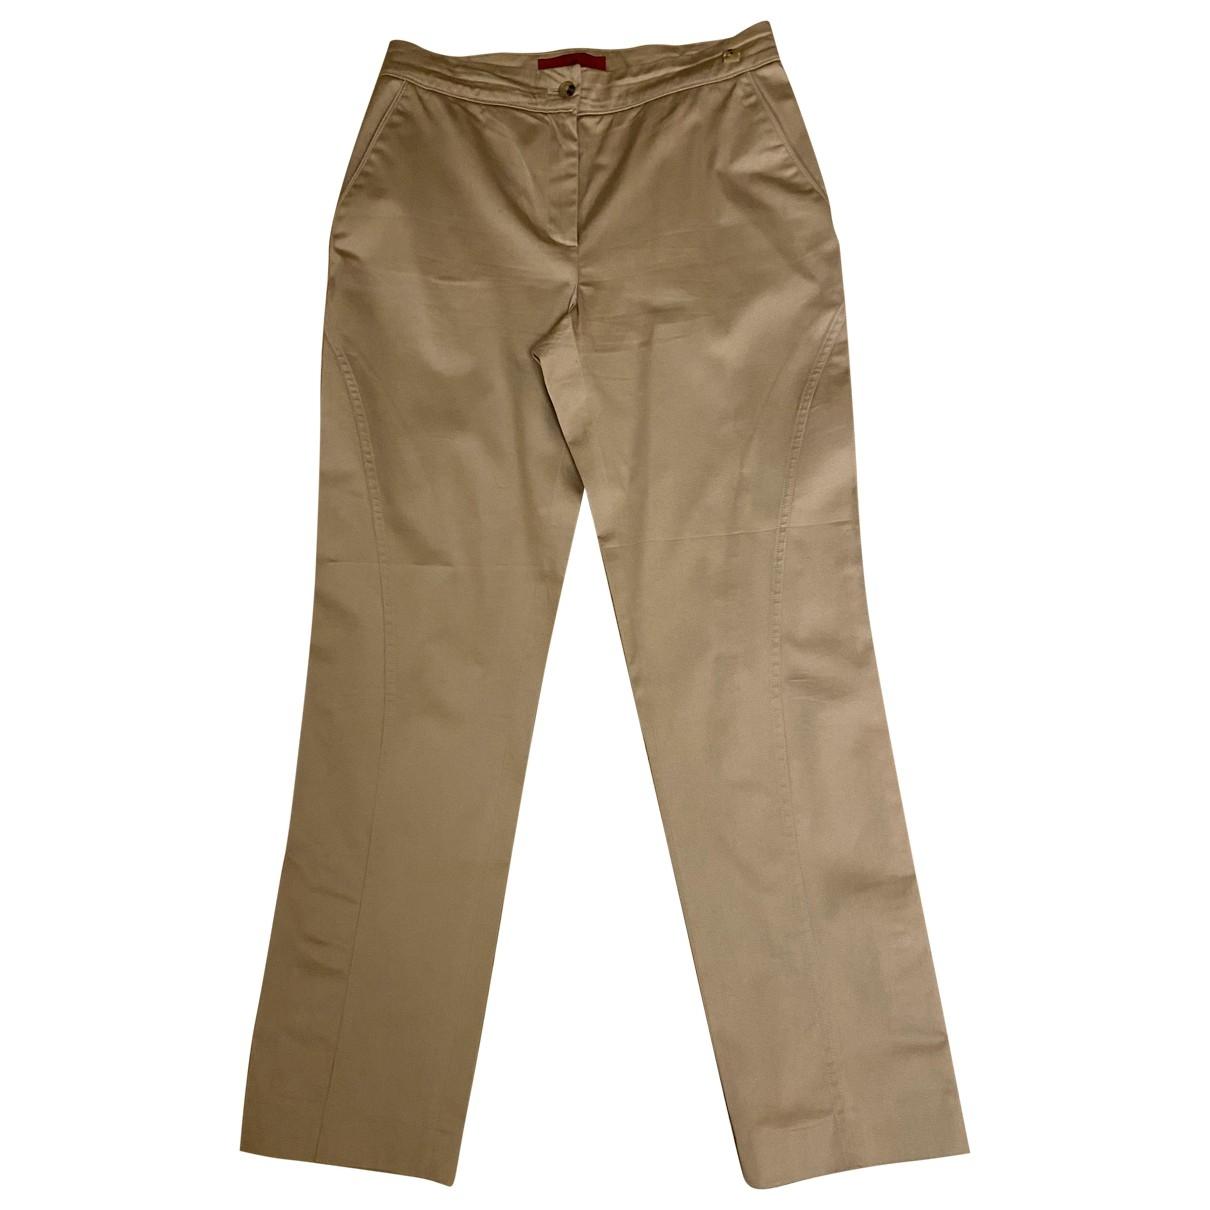 Carolina Herrera \N Beige Cotton Trousers for Women 6 US